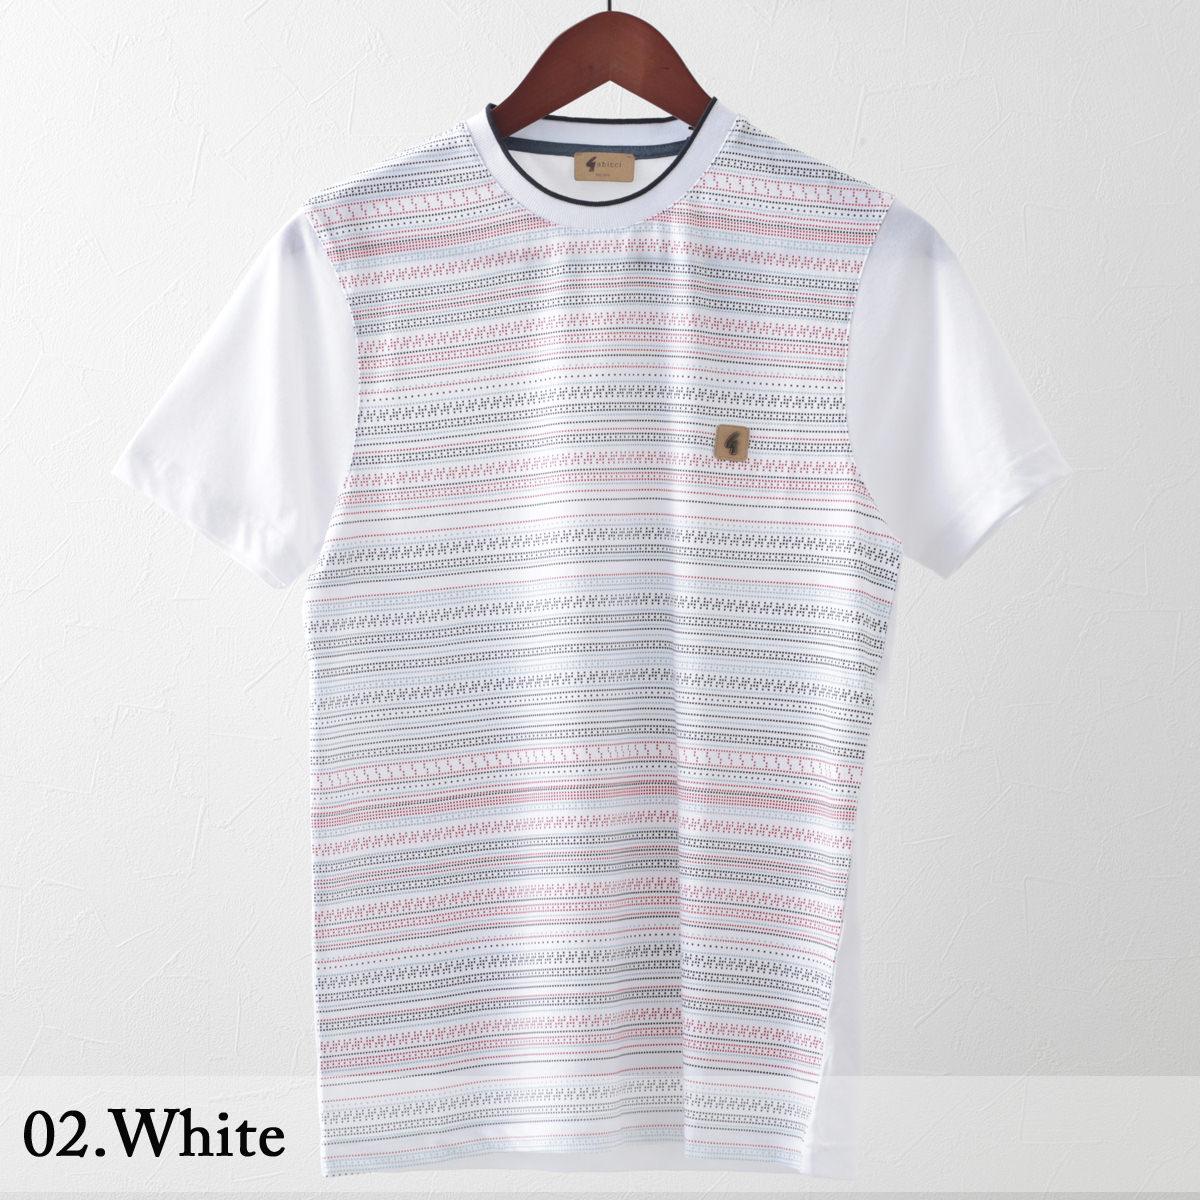 Gabicci メンズ Tシャツ ジオライン ドット ガビッチ 2色 ネイビー ホワイト レトロ モッズファッション